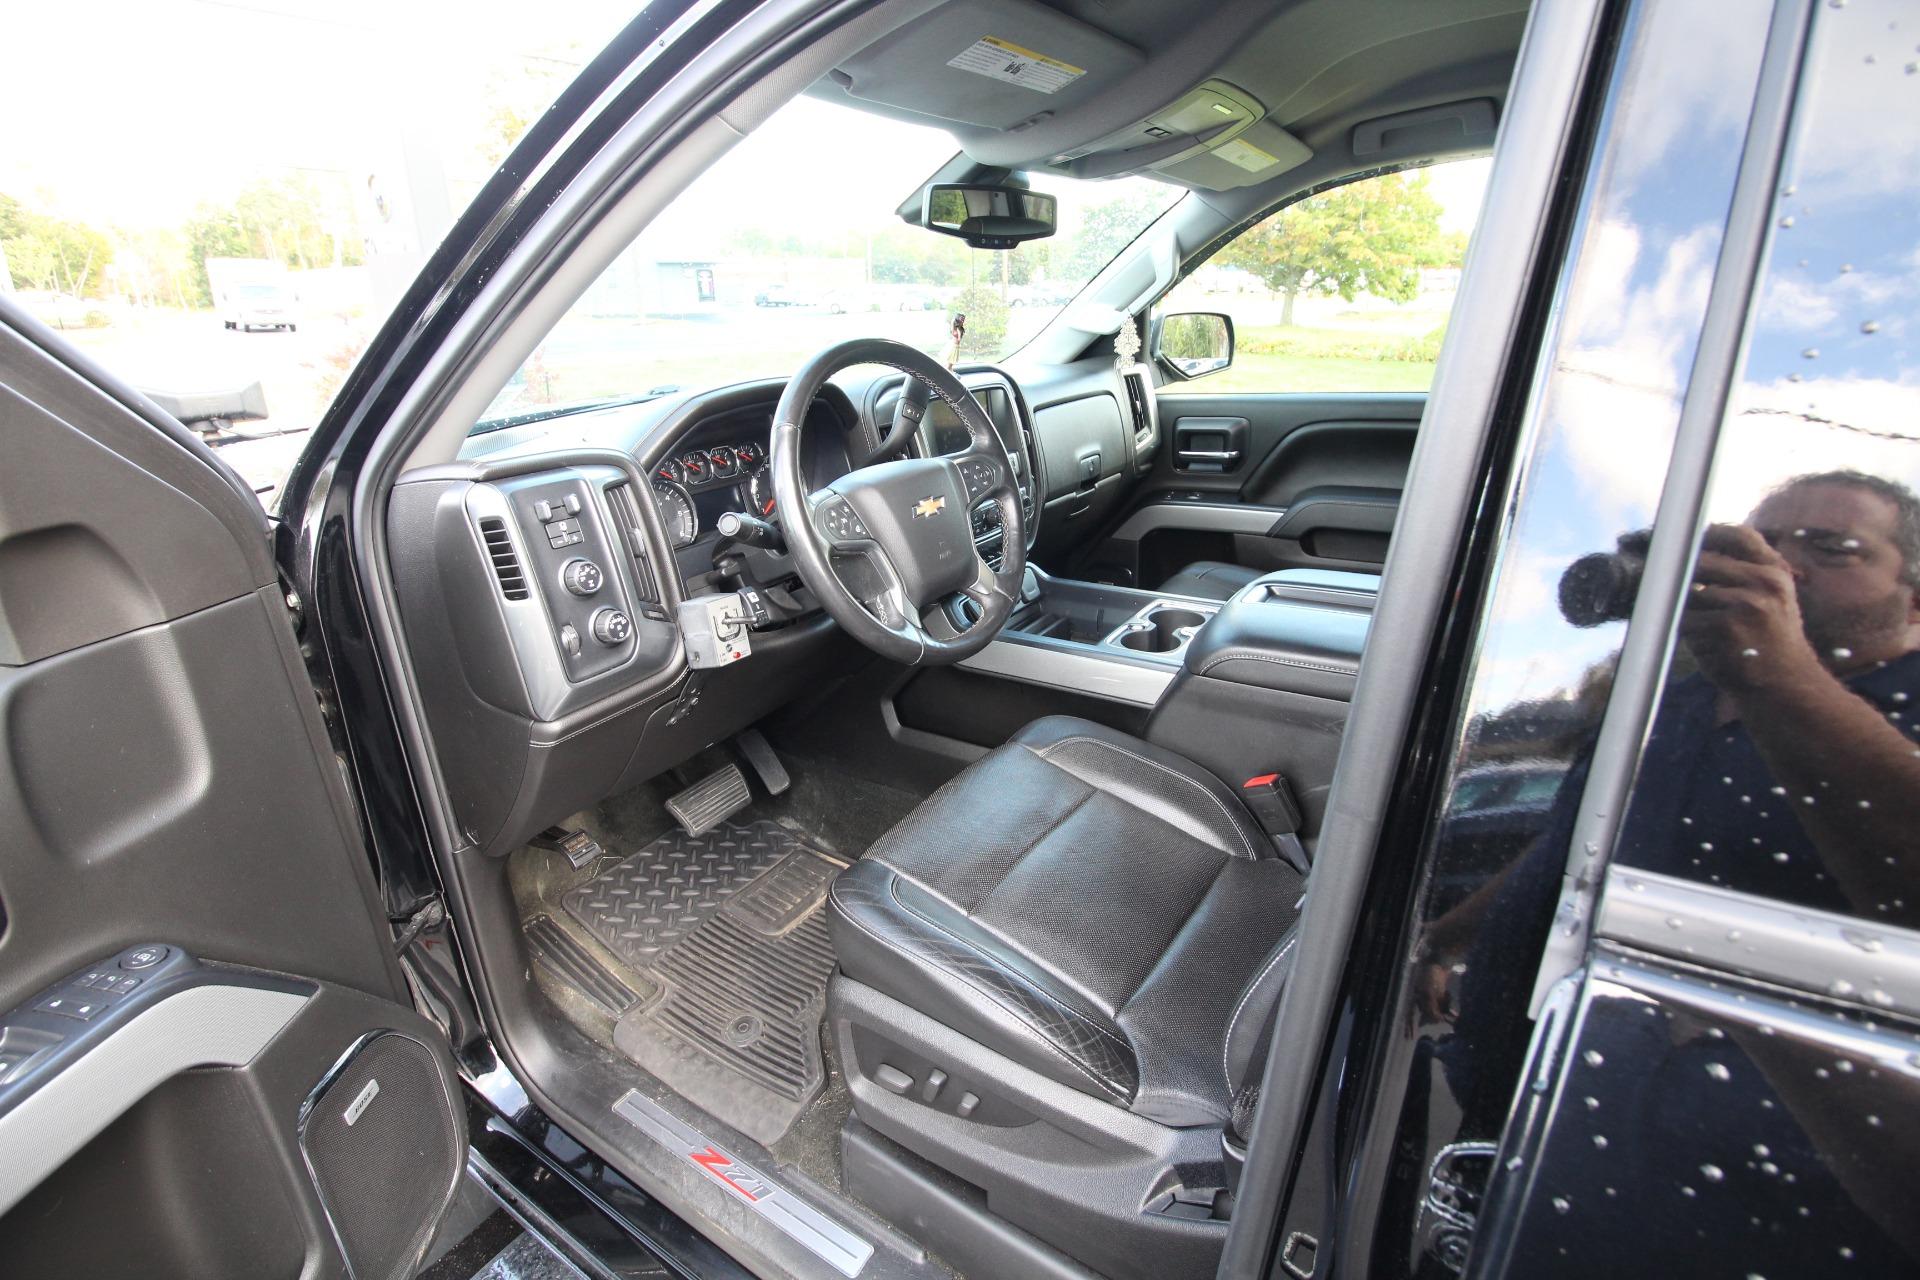 Used 2014 Chevrolet Silverado 1500 LTZ Z71 DOUBLE CAB 4WD LIKE NEW FISHER 7.5ft PLOW | Albany, NY